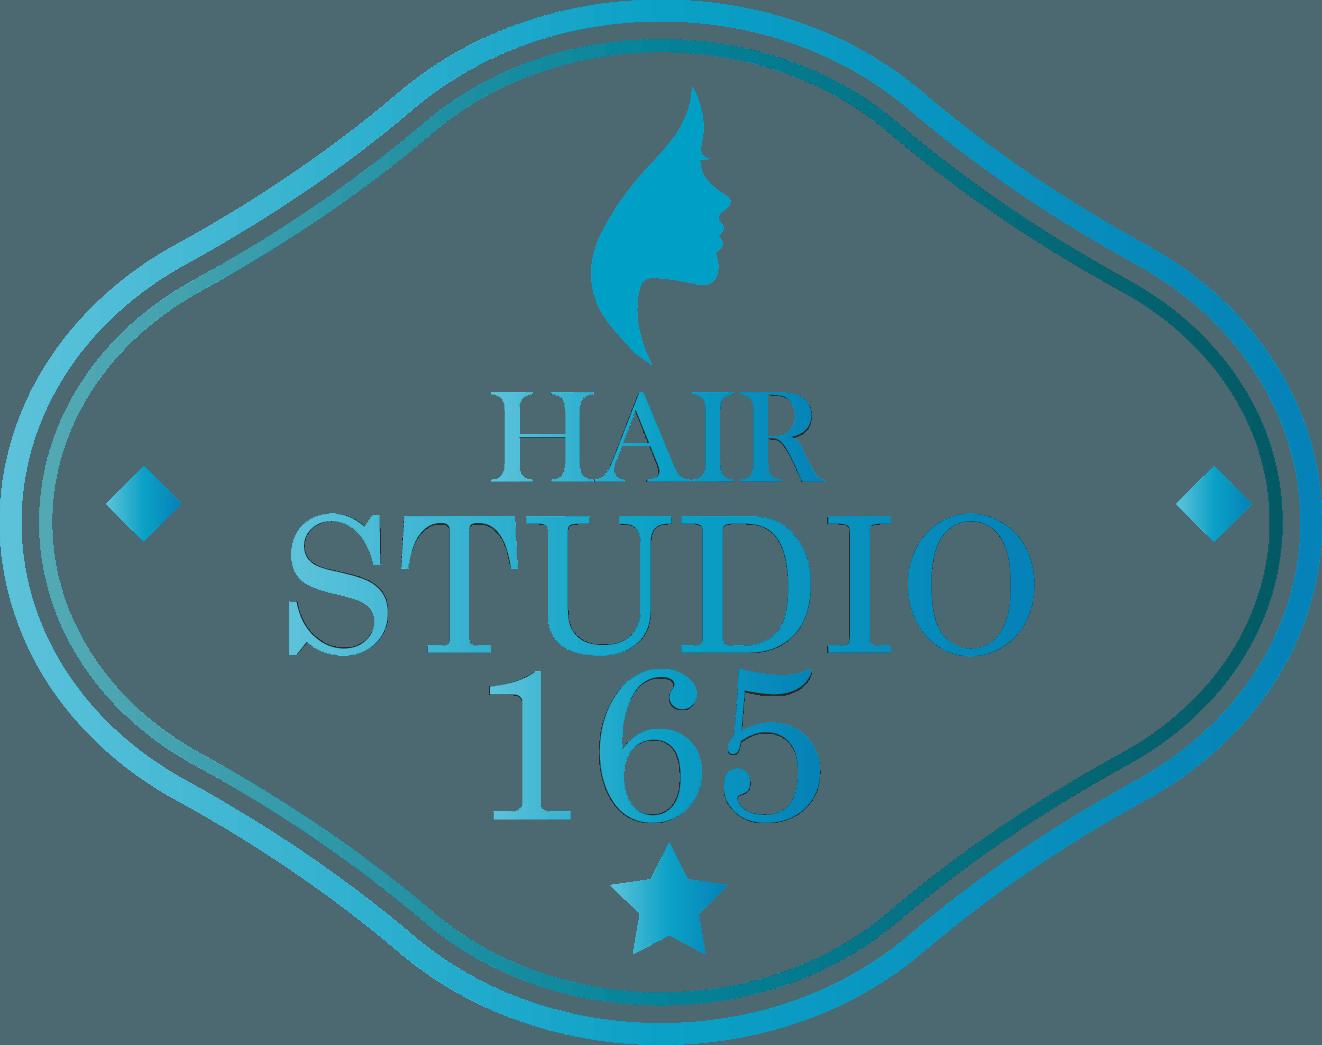 Hair Studio 165